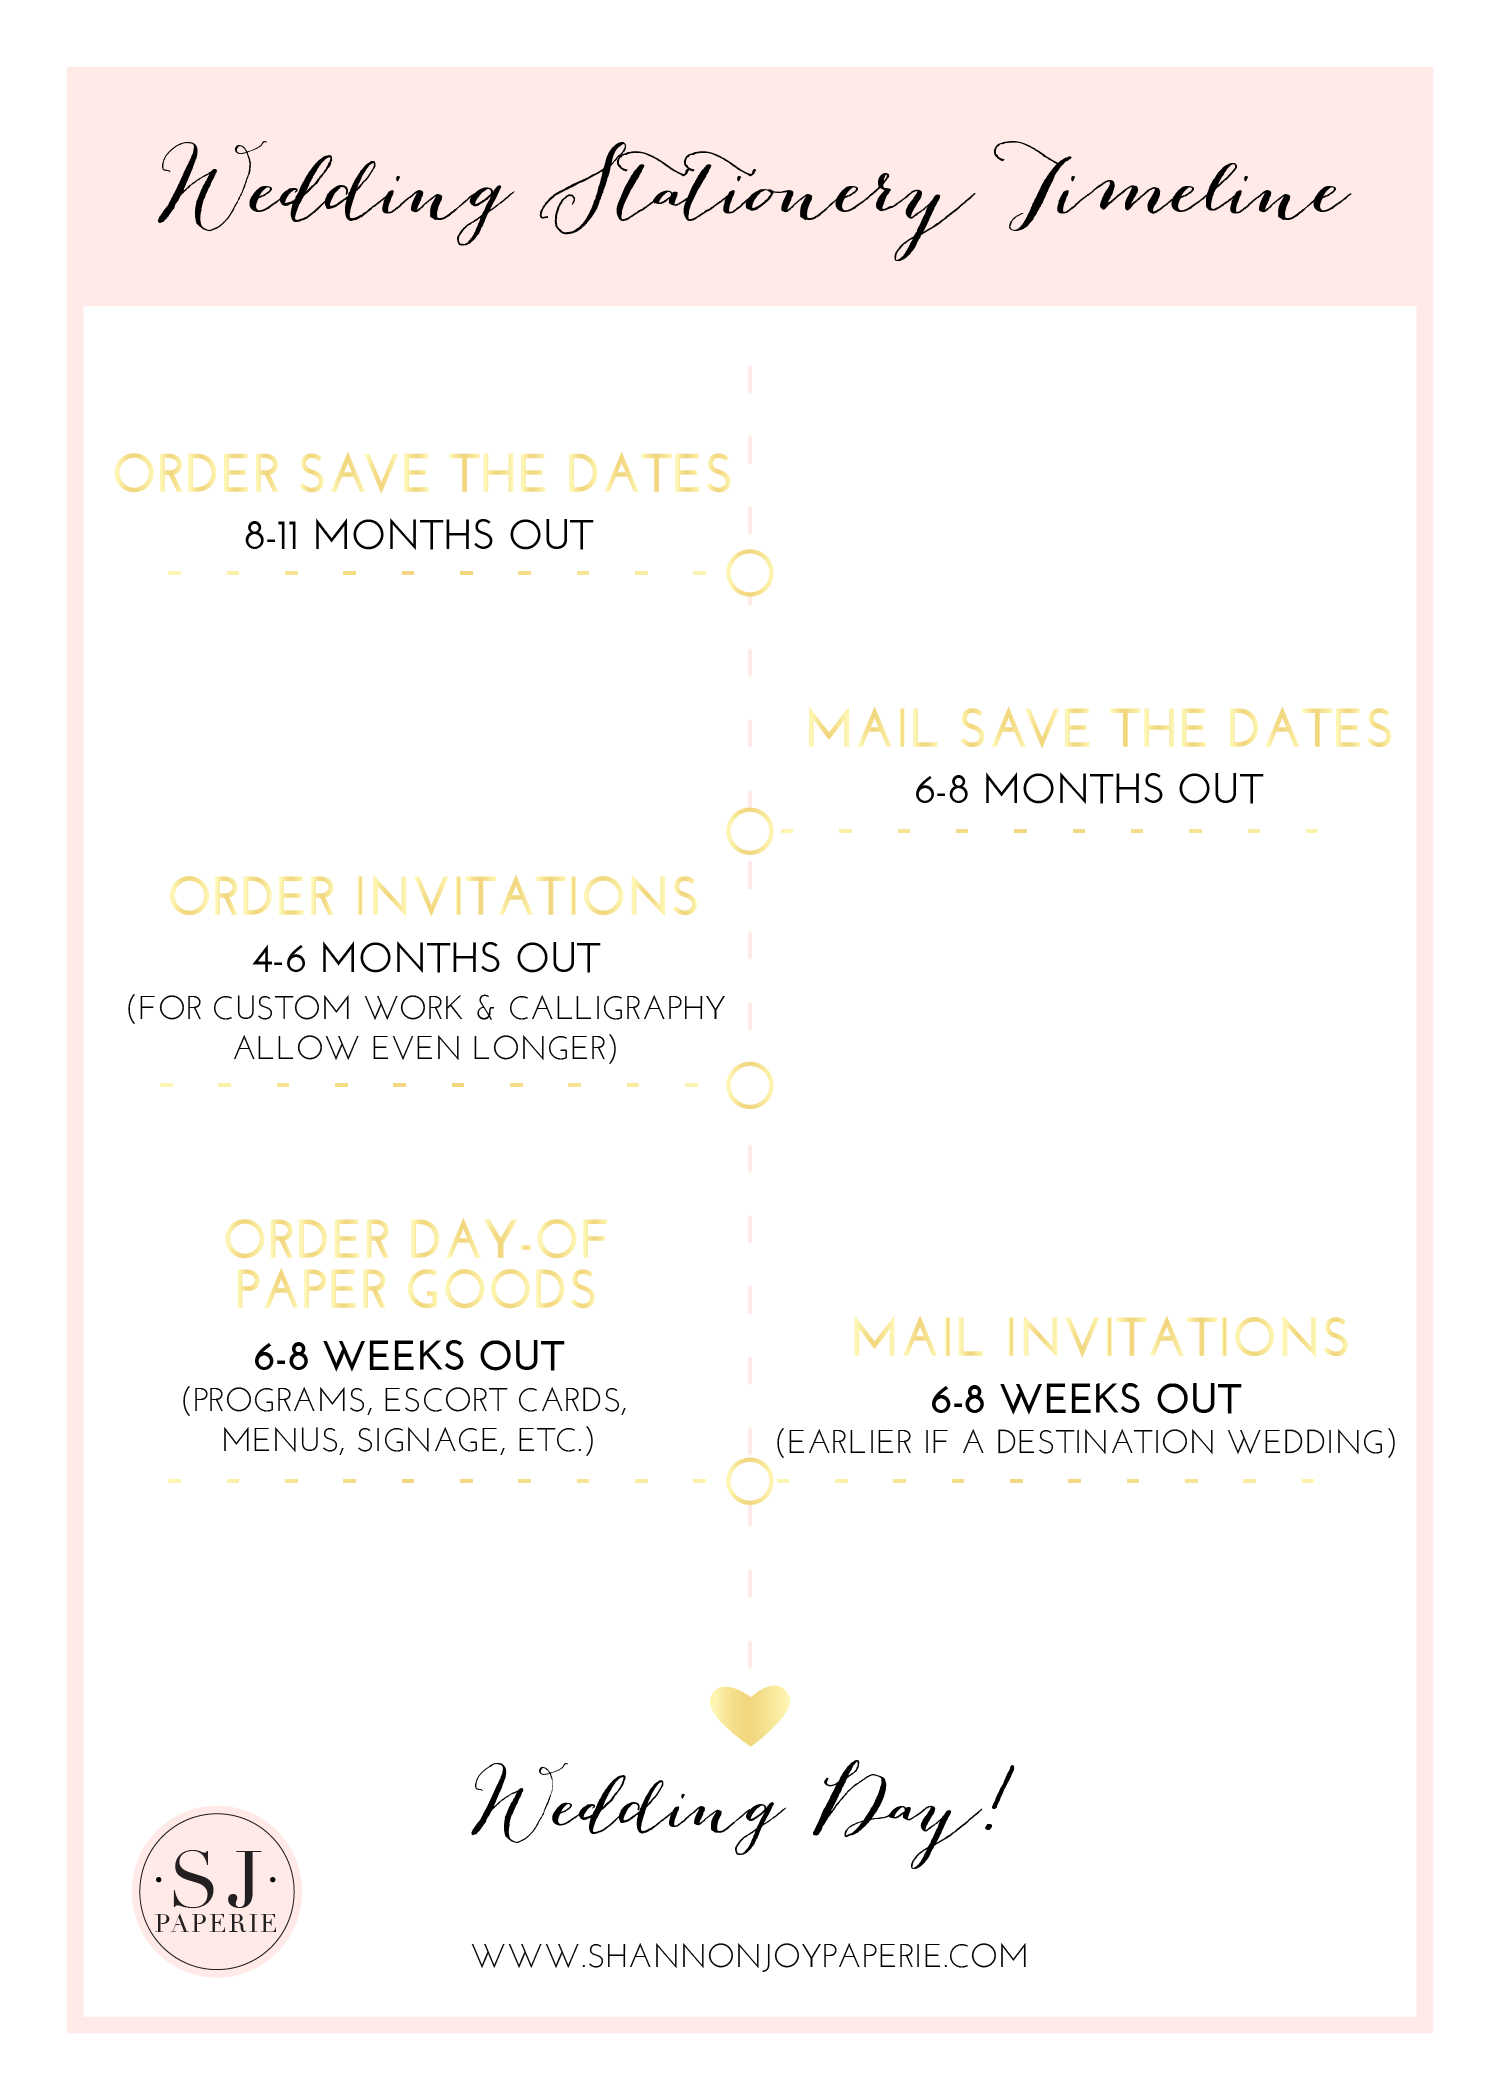 Wedding Stationery Timeline // Shannon Joy Paperie